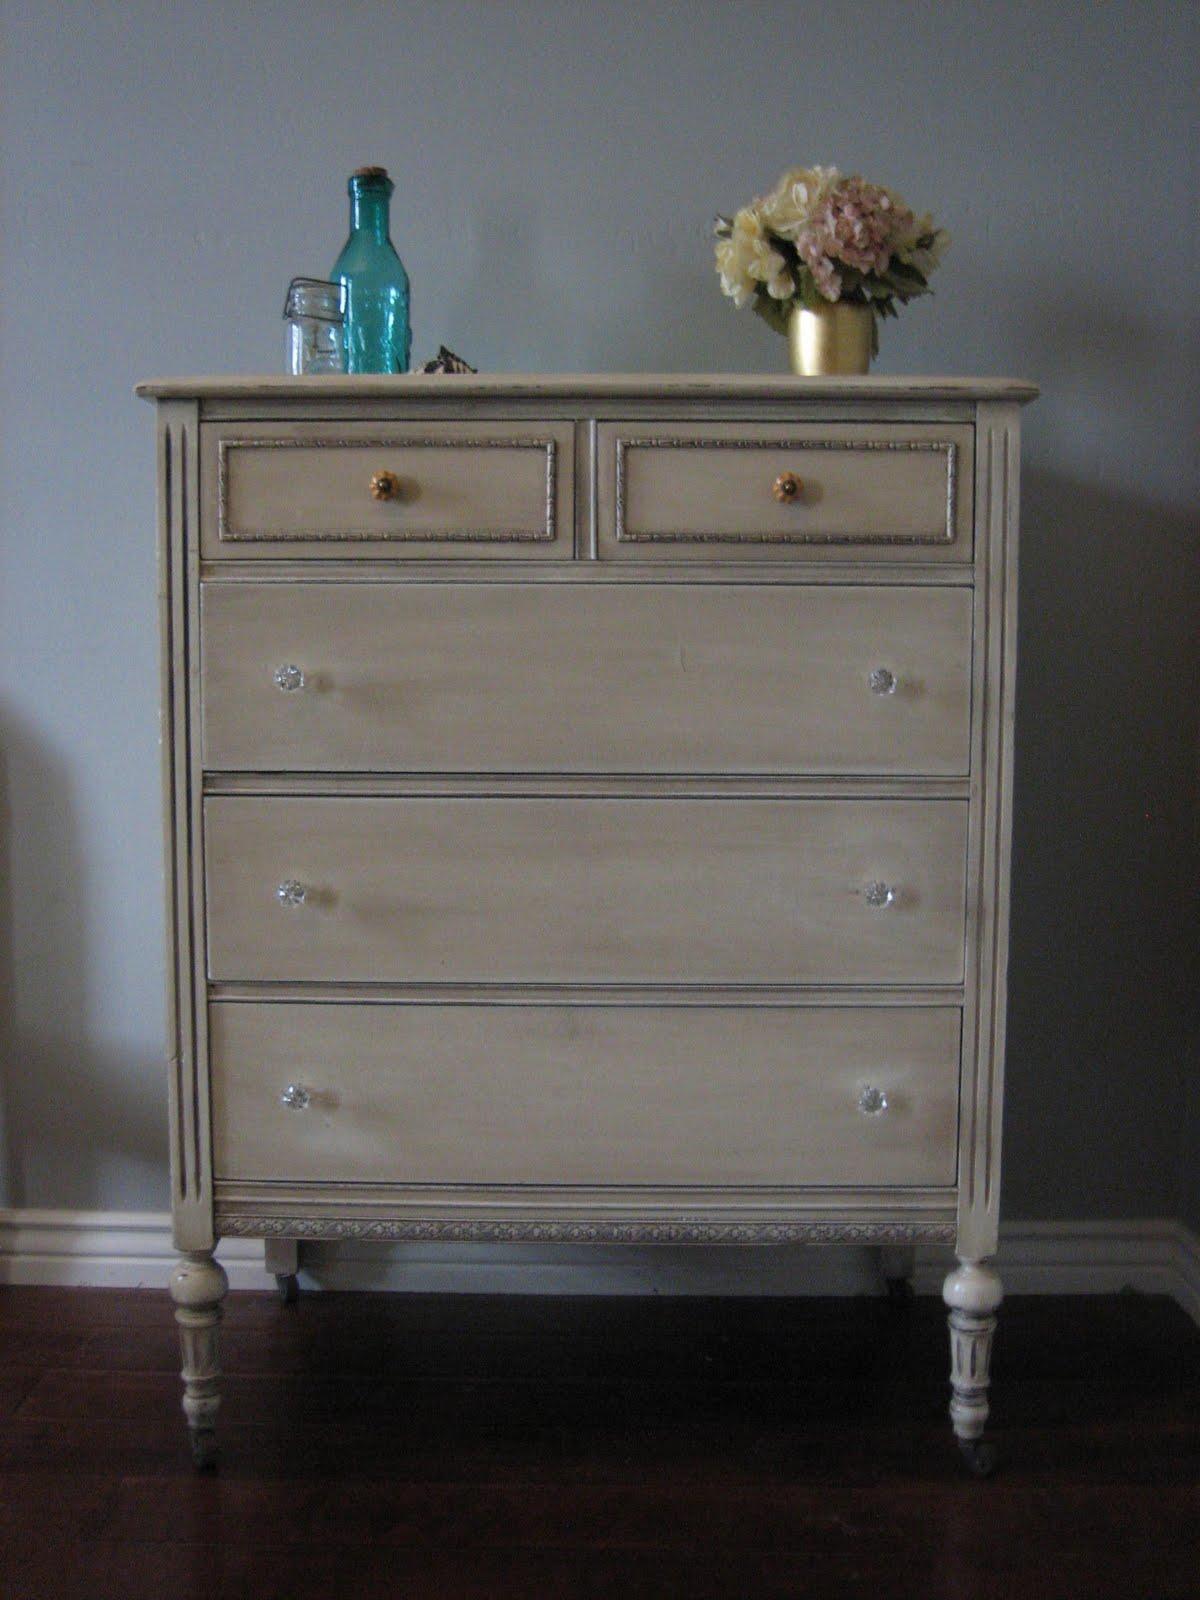 European Paint Finishes  TurquoiseTeal  Cream Bedroom Set